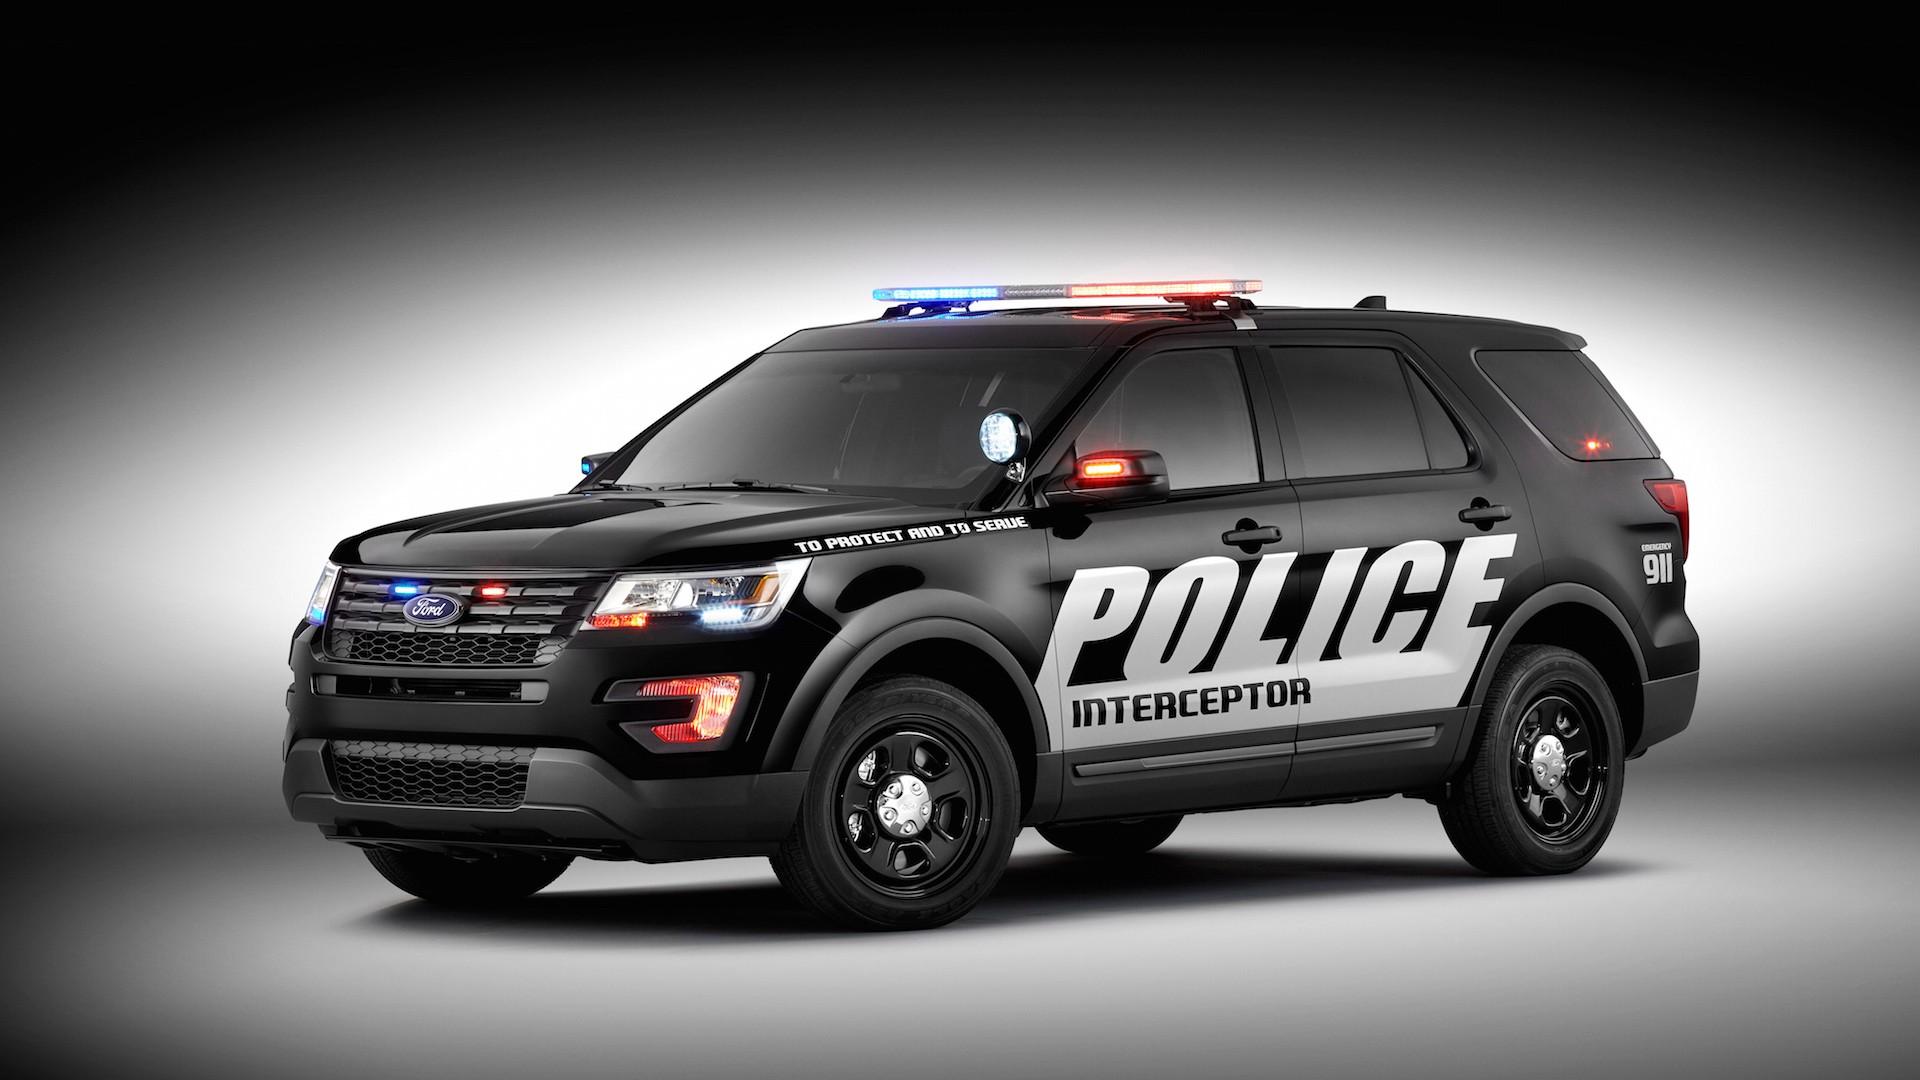 Bmw 3d Hd Wallpapers 2016 Ford Police Interceptor Wallpaper Hd Car Wallpapers